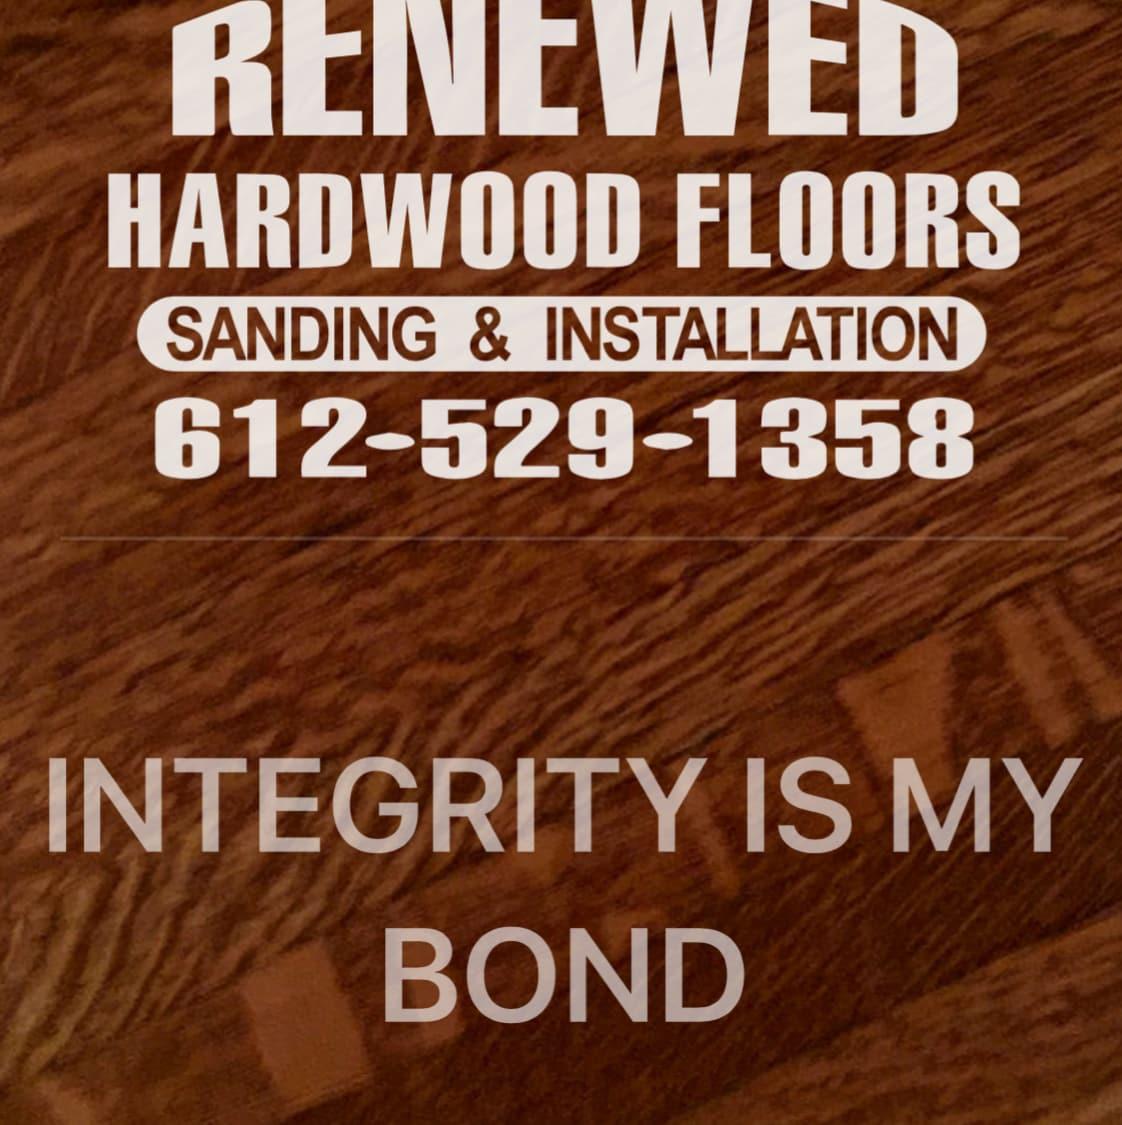 Renewed Hardwood Floors Inc logo